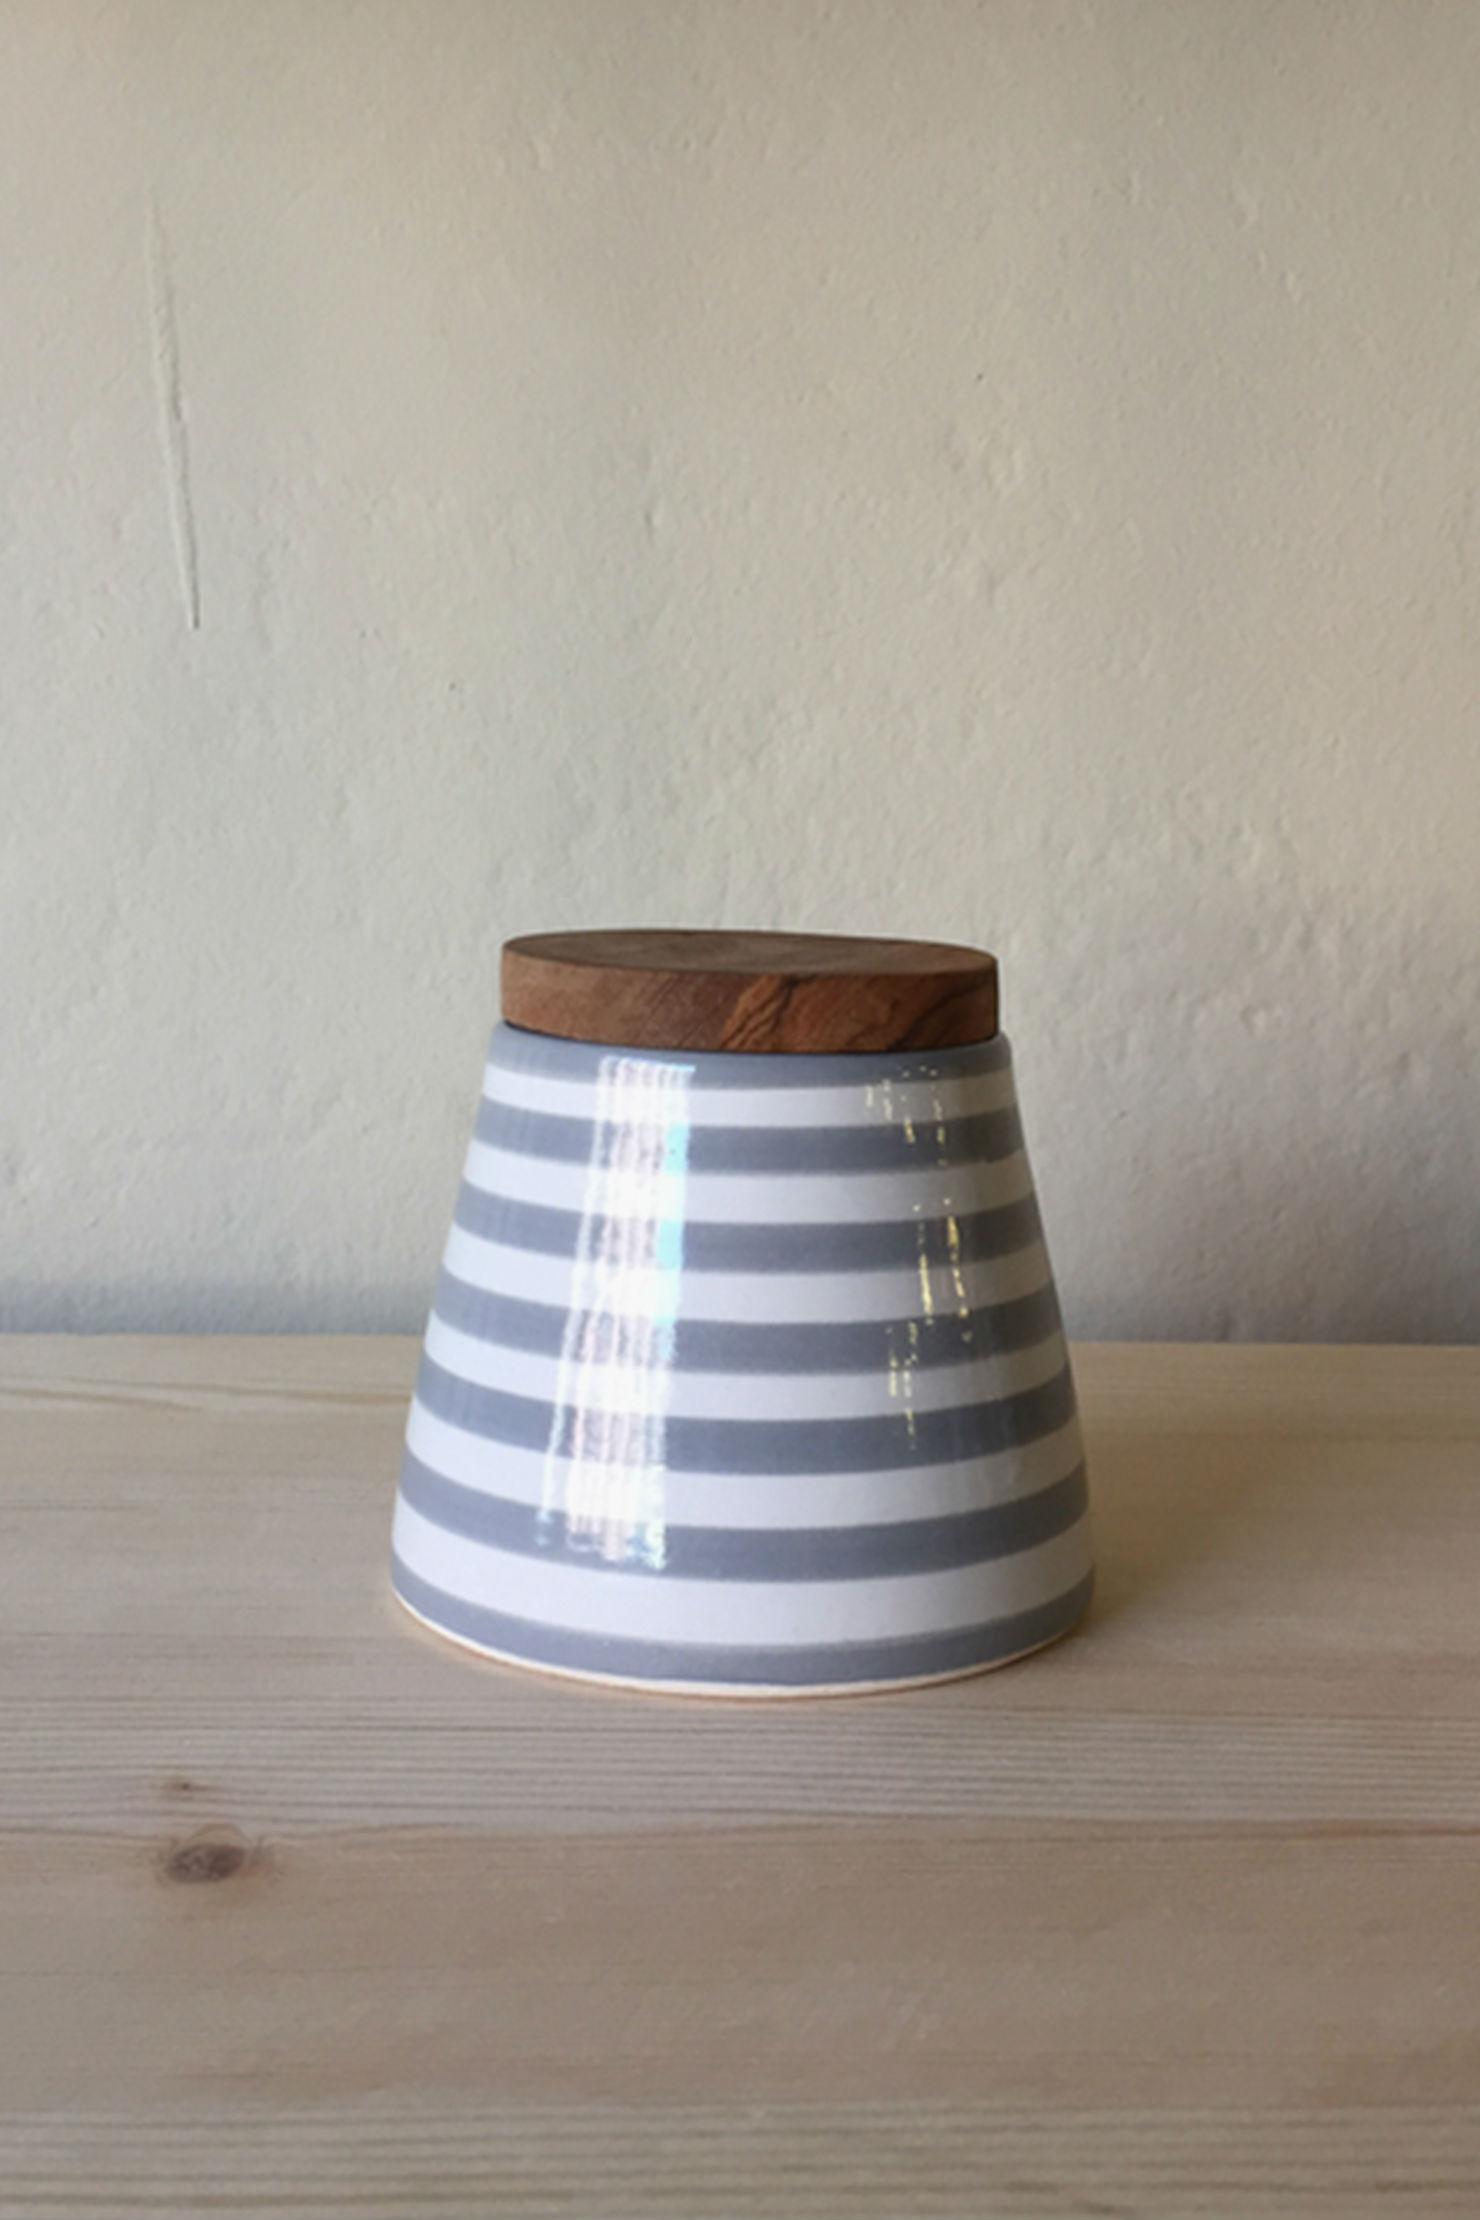 boites-coniques-cuisine-chabi-chic-gris-raye